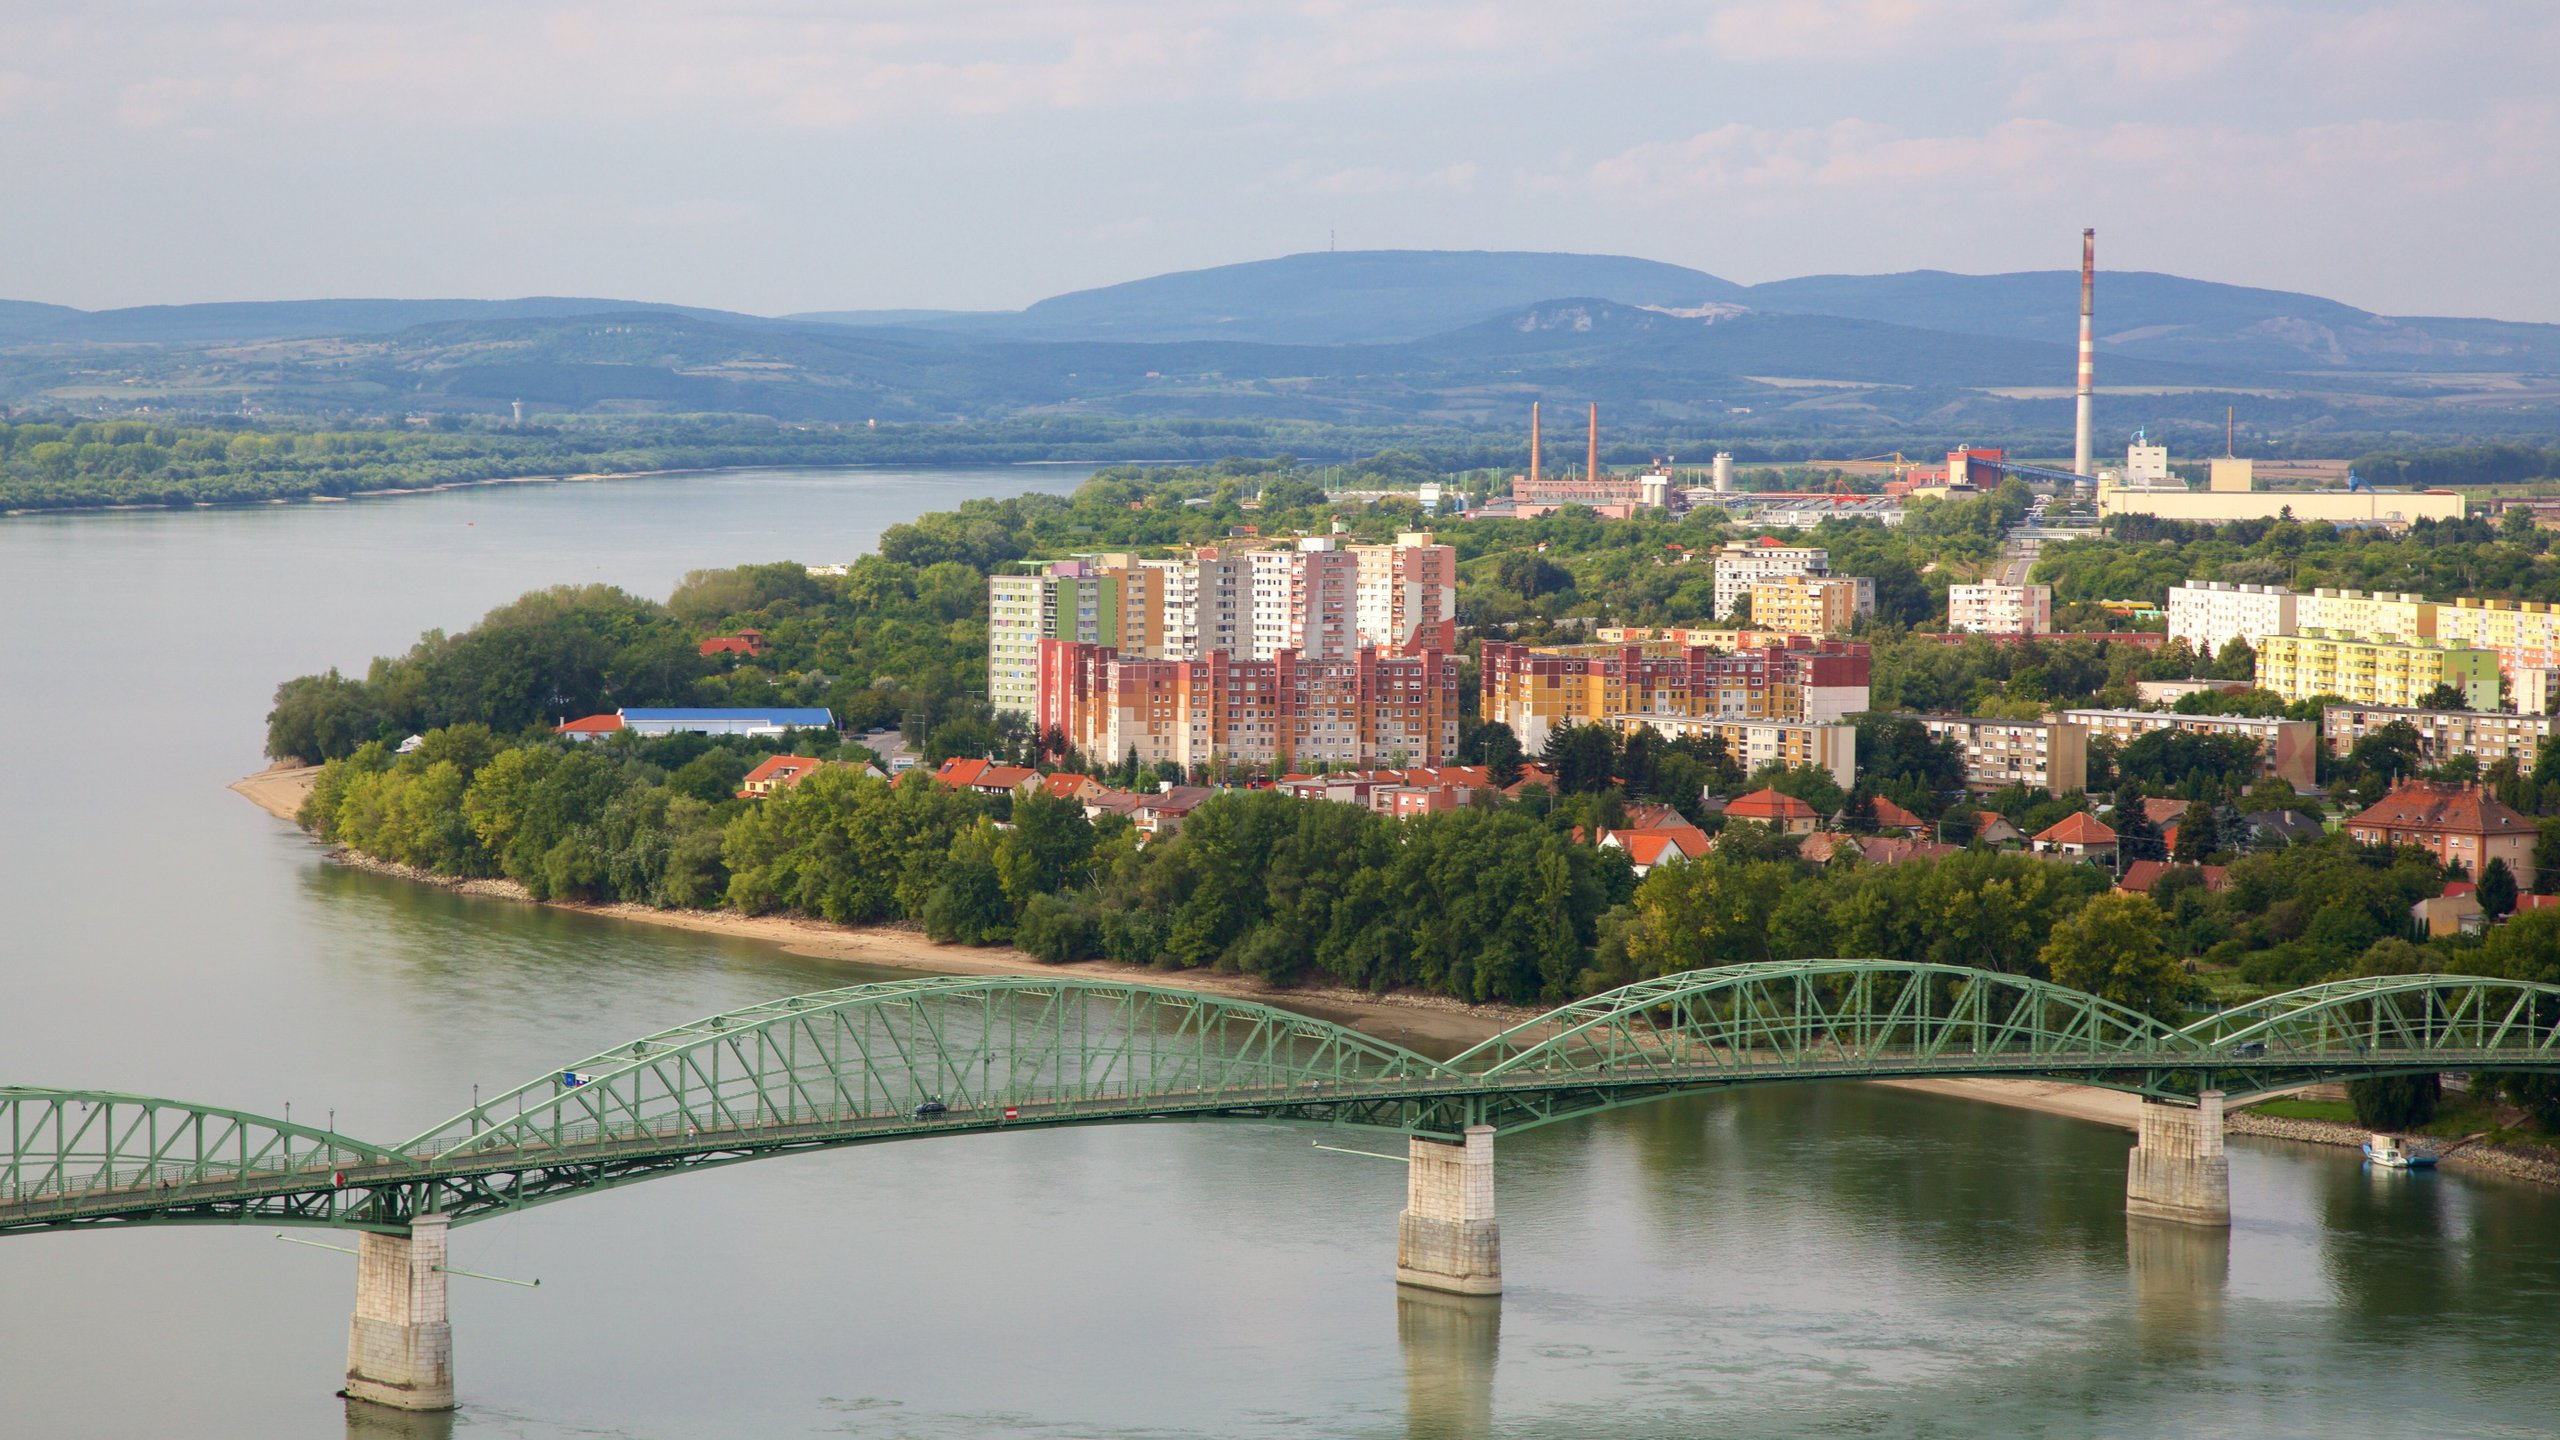 Esztergom, Comitat de Komárom-Esztergom, Hongrie